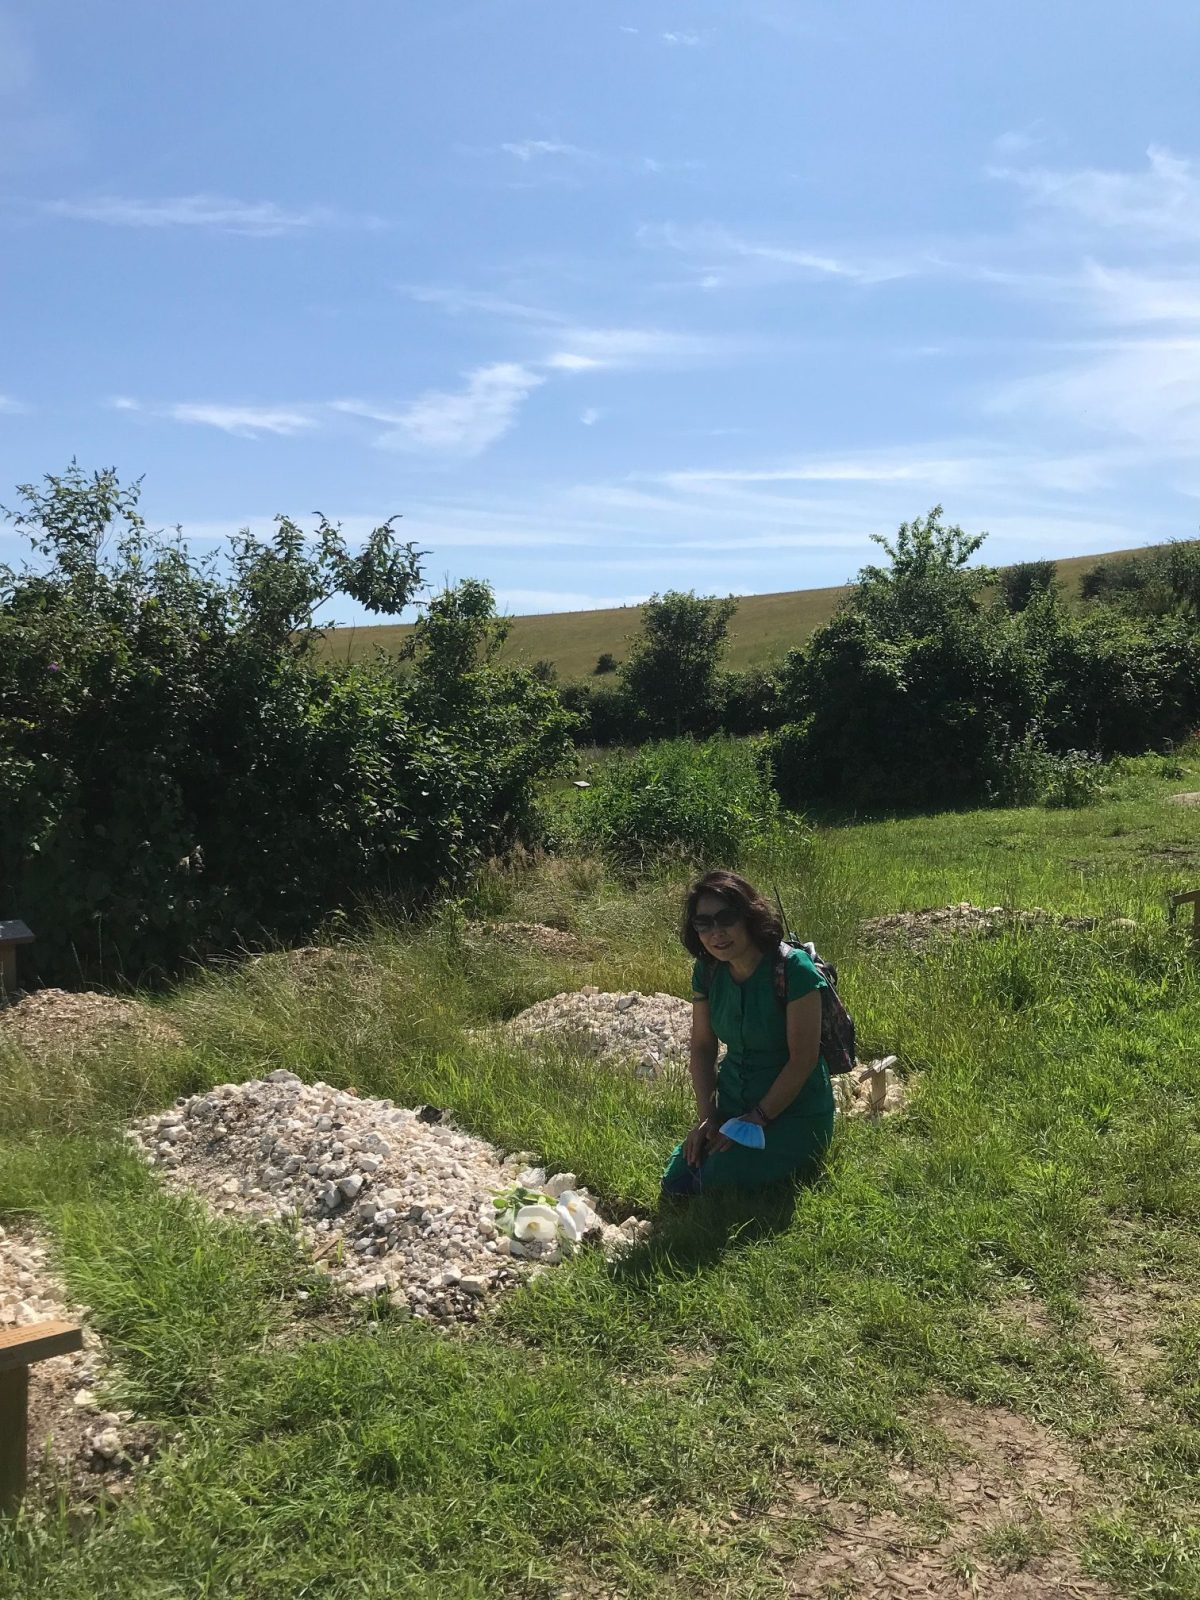 Emiko at Sybil's grave